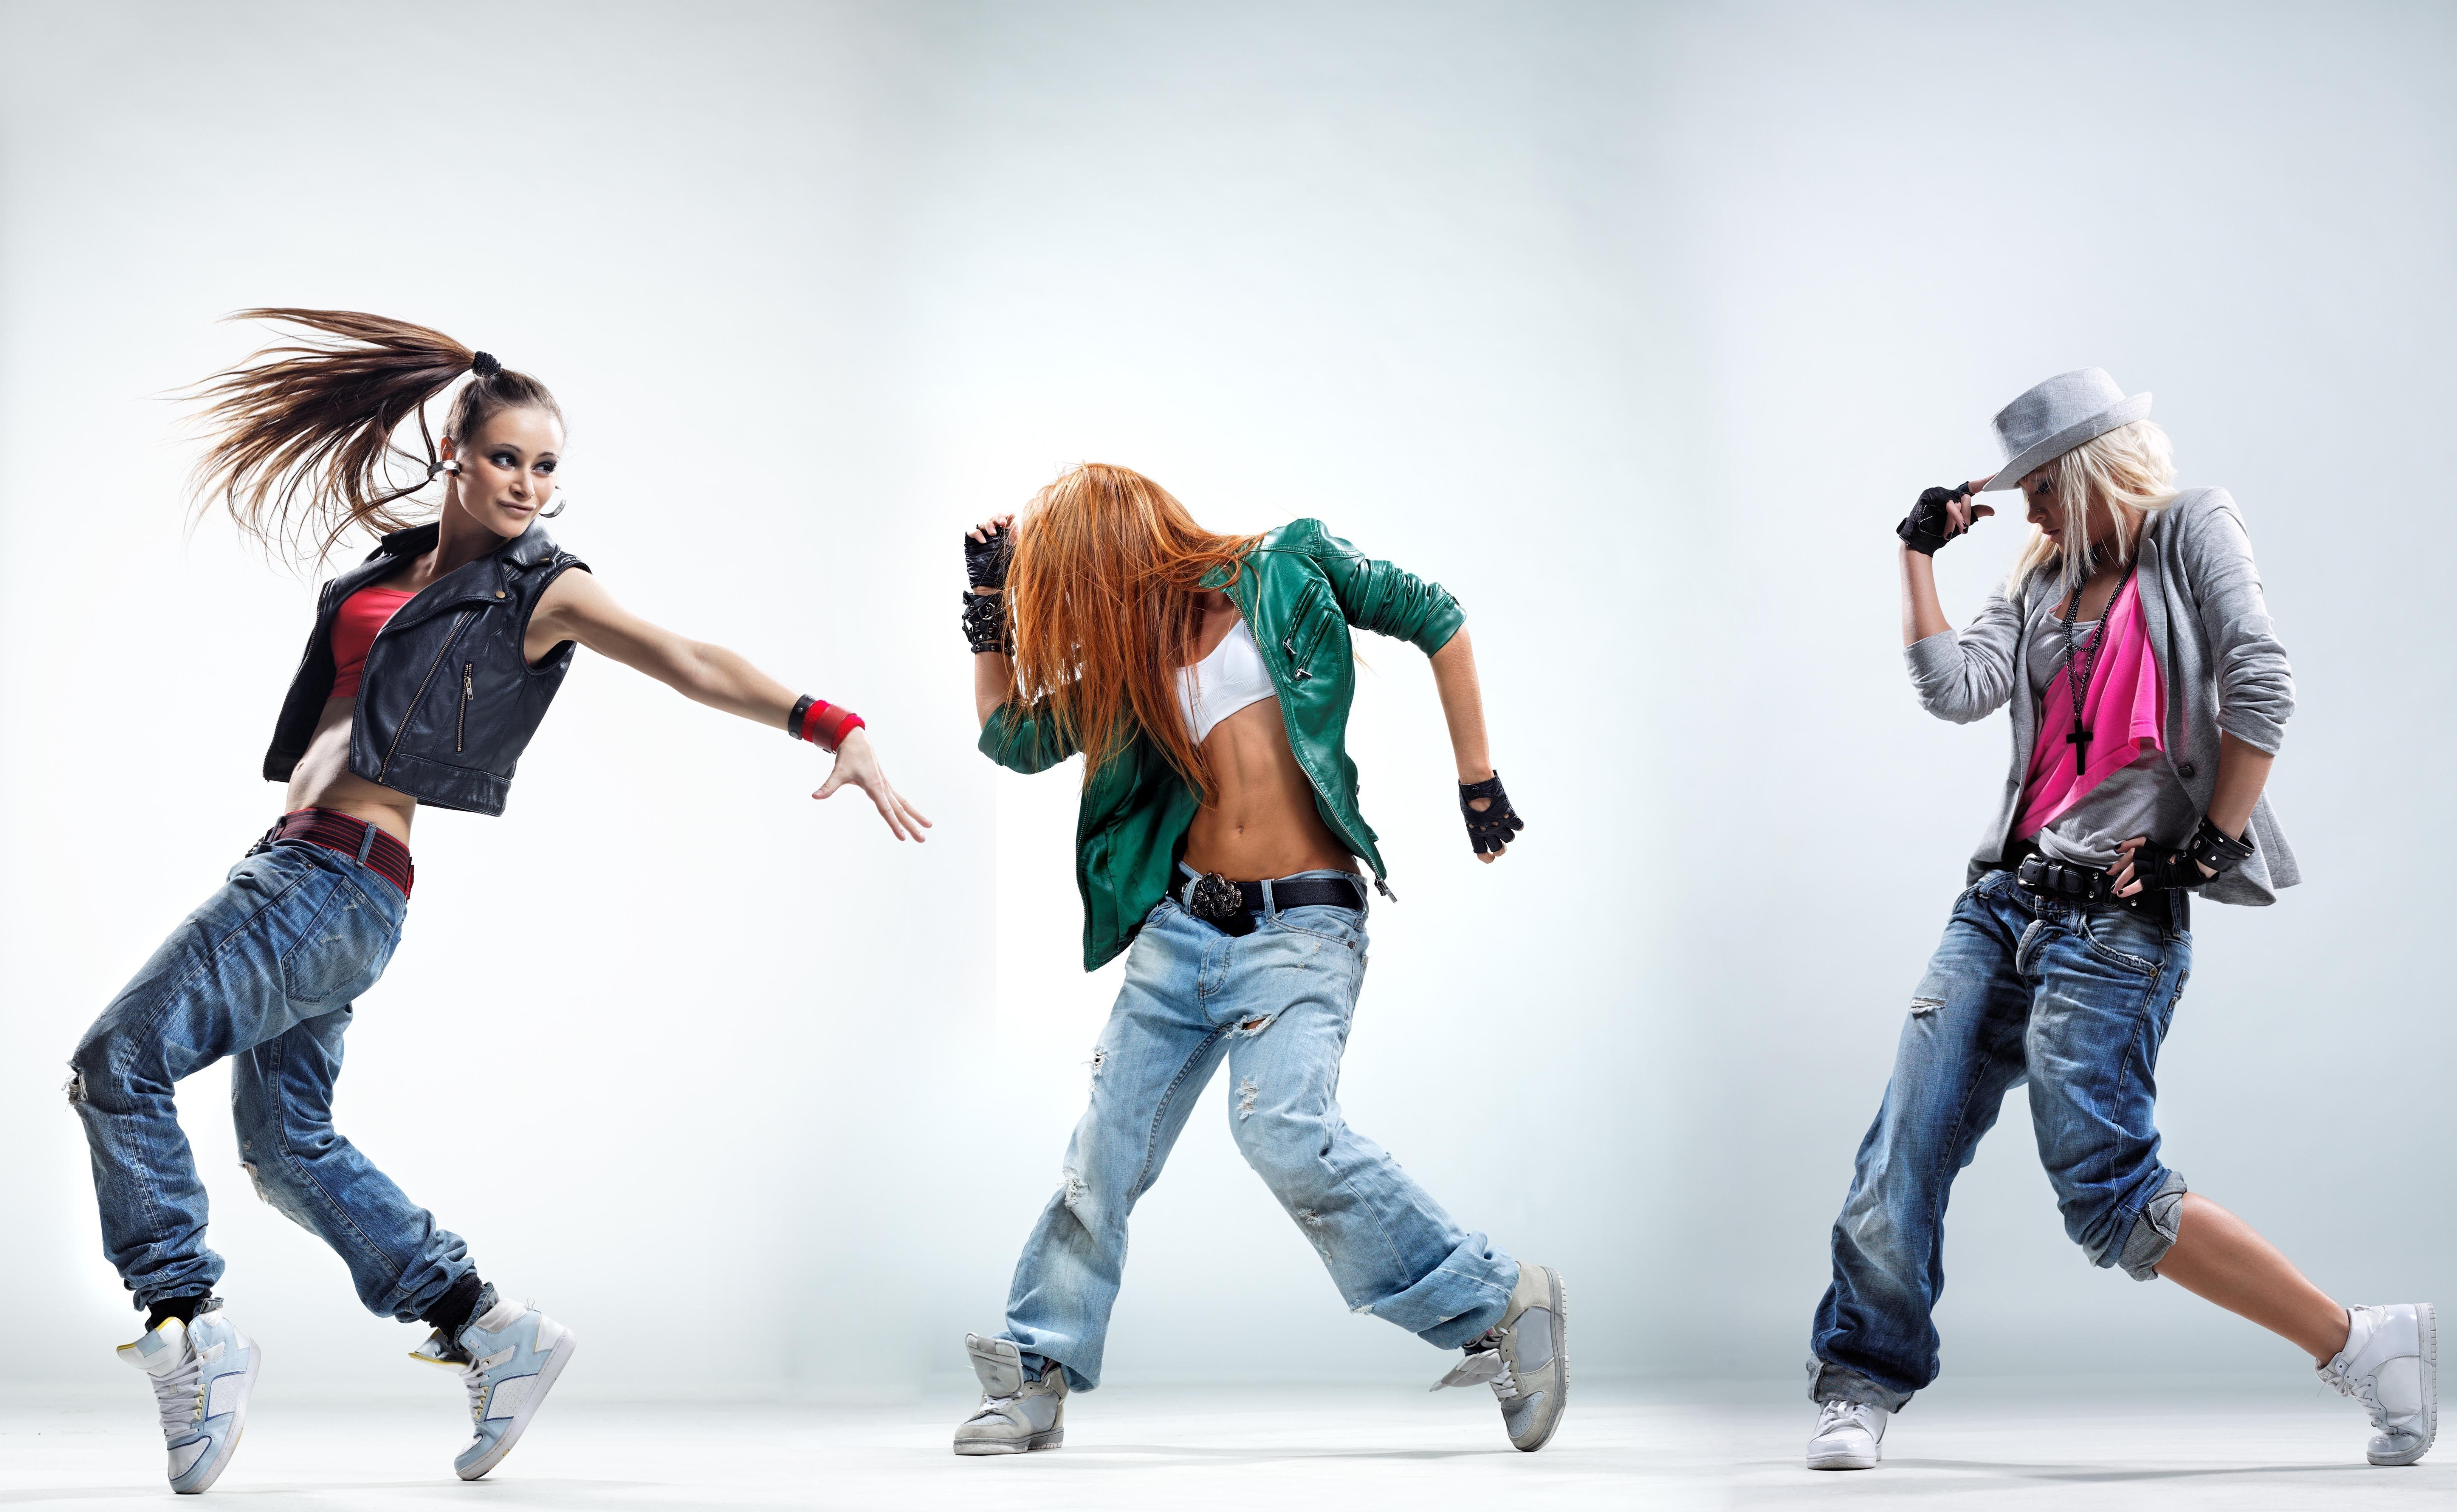 Hiphop funky funk ballerina ballarina dancer hiphop funky funk ballerina ballarina dancer bailarina voltagebd Choice Image